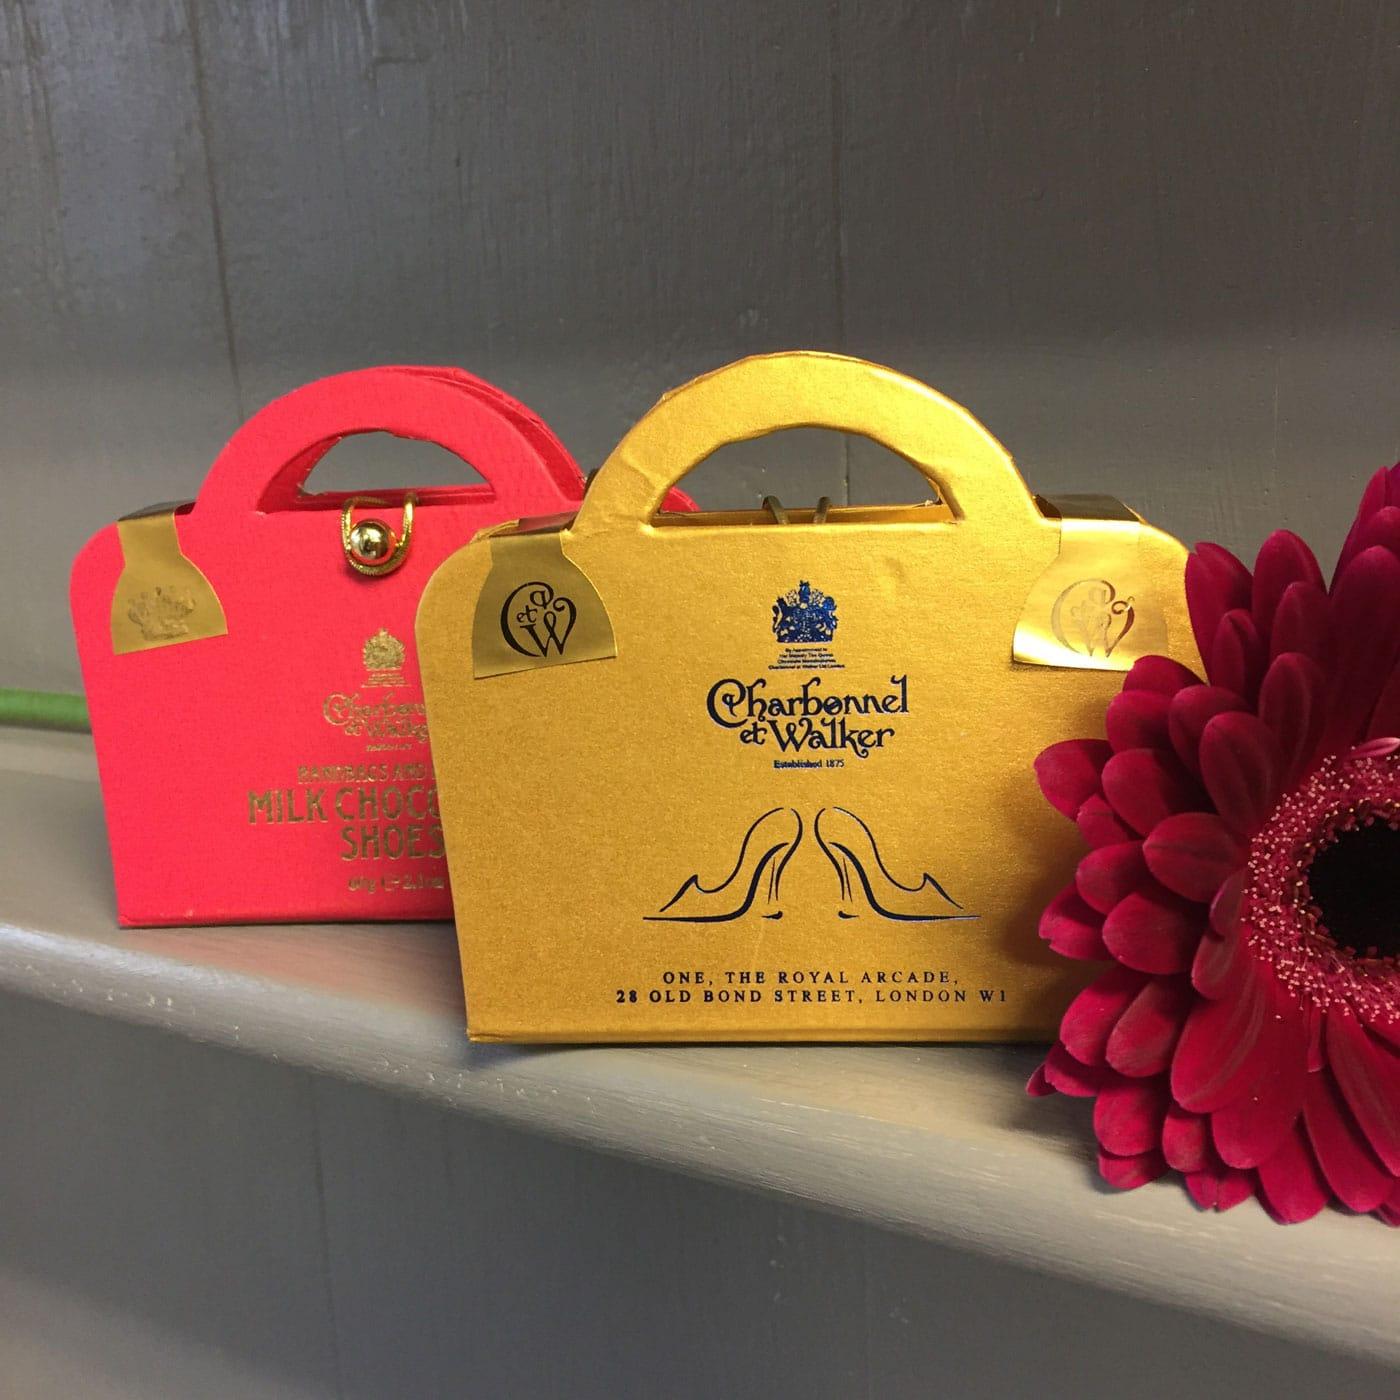 ee69c3faab Charbonnel Et Walker Handbag   Heels Milk Chocolate - Lisa s Florist